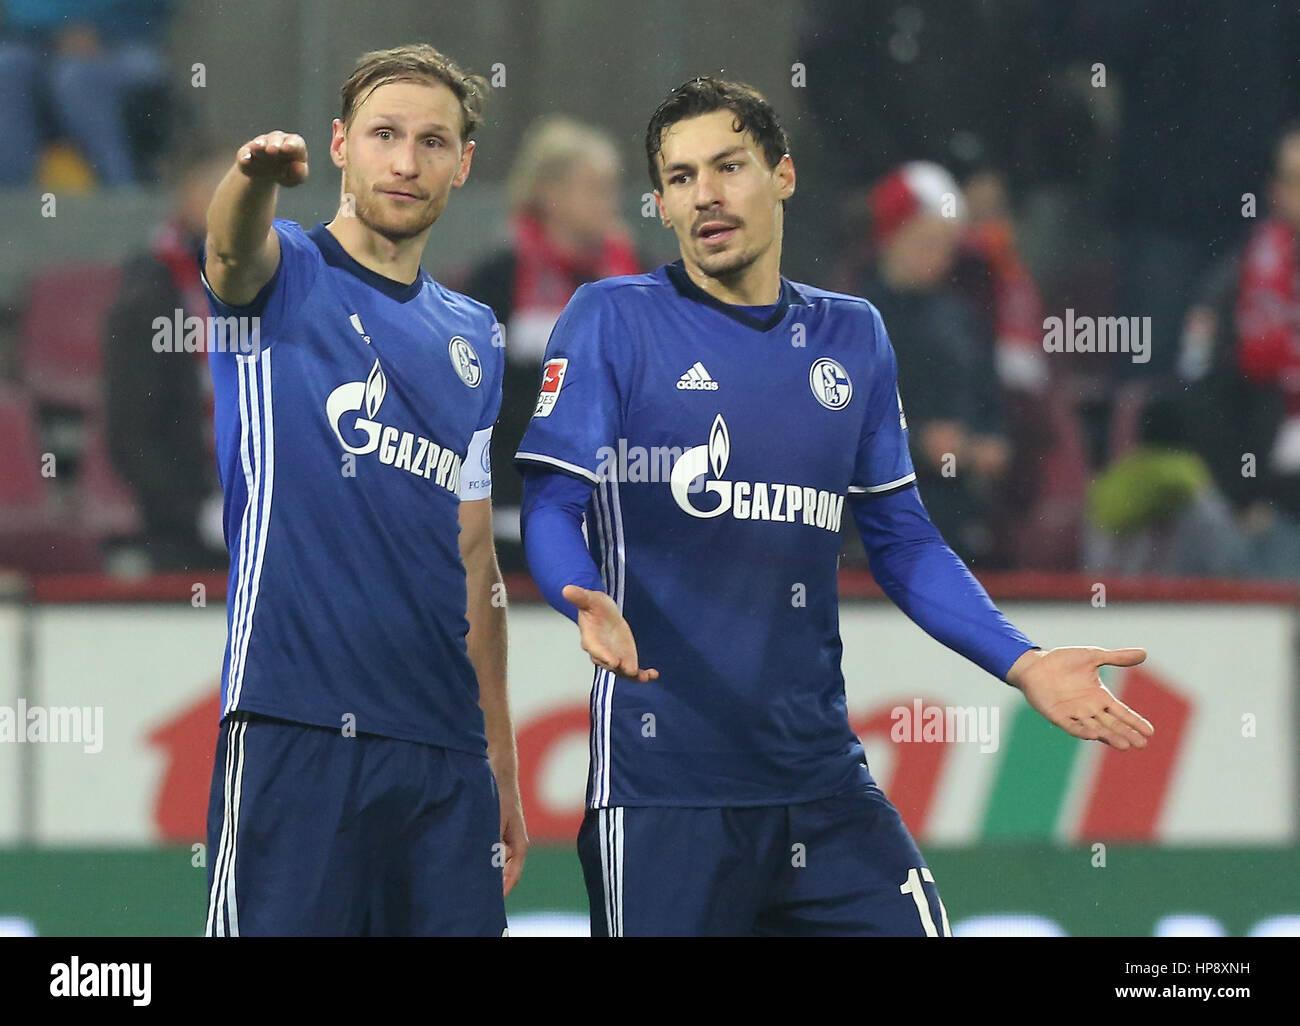 Cologne, Germany, February 19, 2017, Bundesliga matchday 21, 1. FC Koeln - FC Schalke 04:  Benedikt Hoewedes (Schalke, - Stock Image